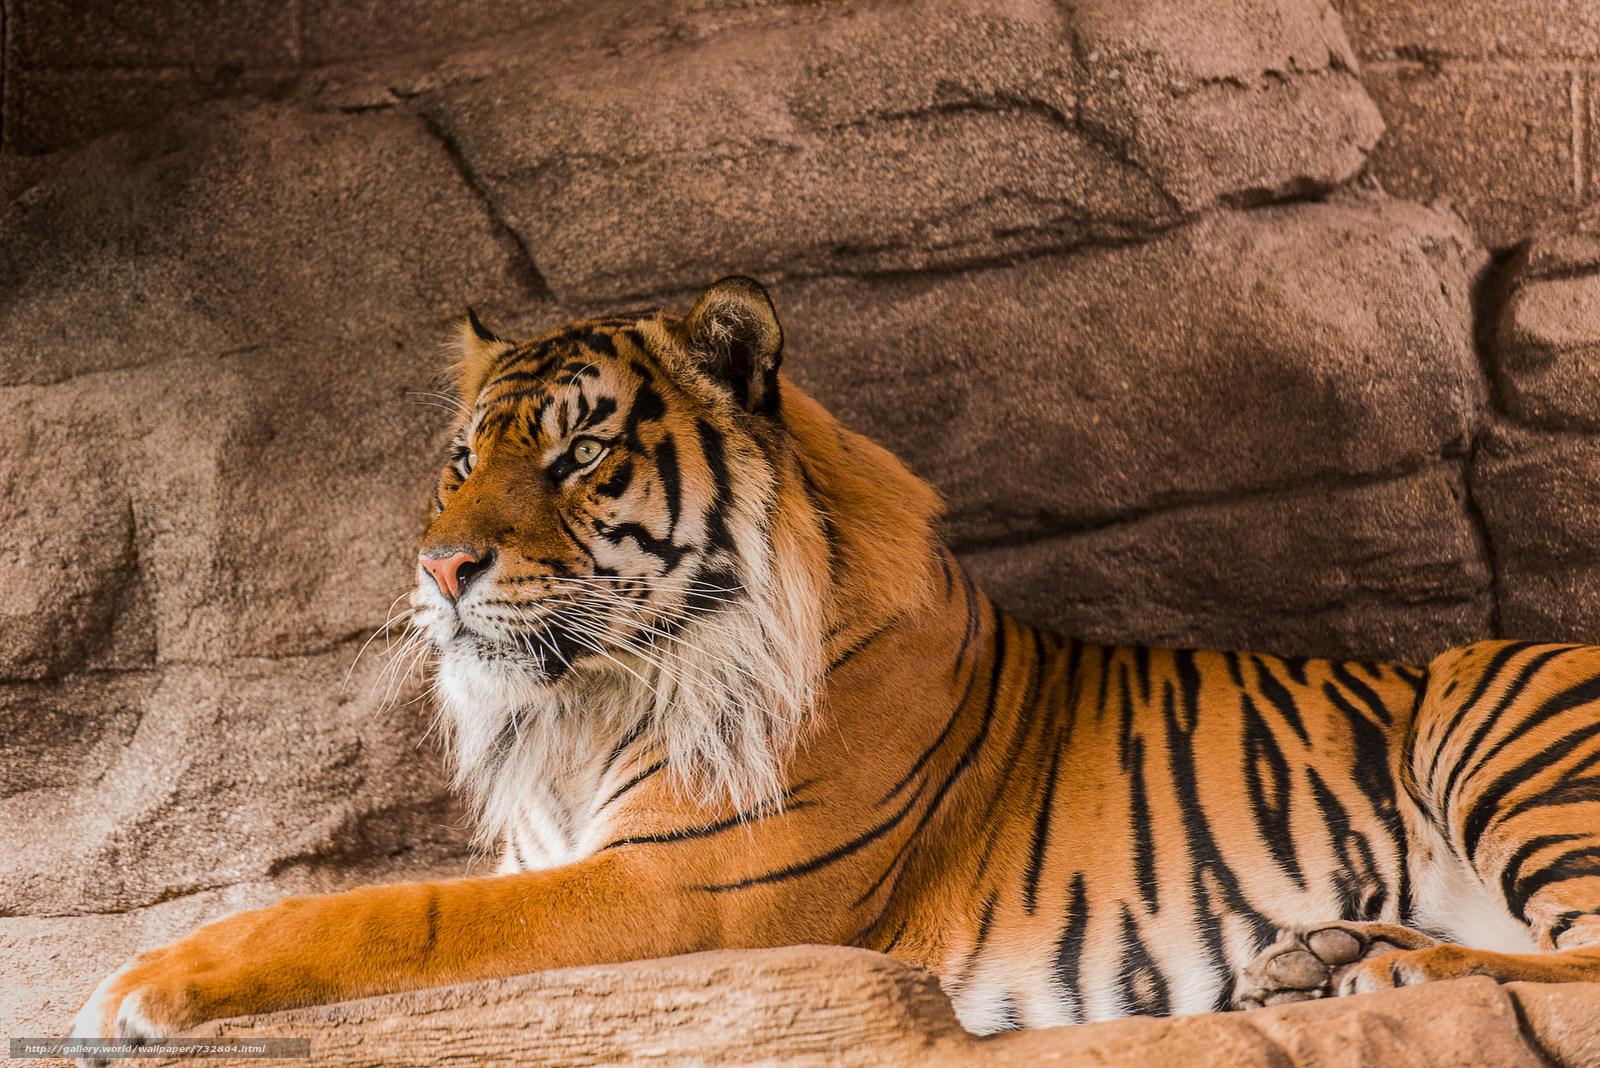 tiger, Sumatran tiger, predator